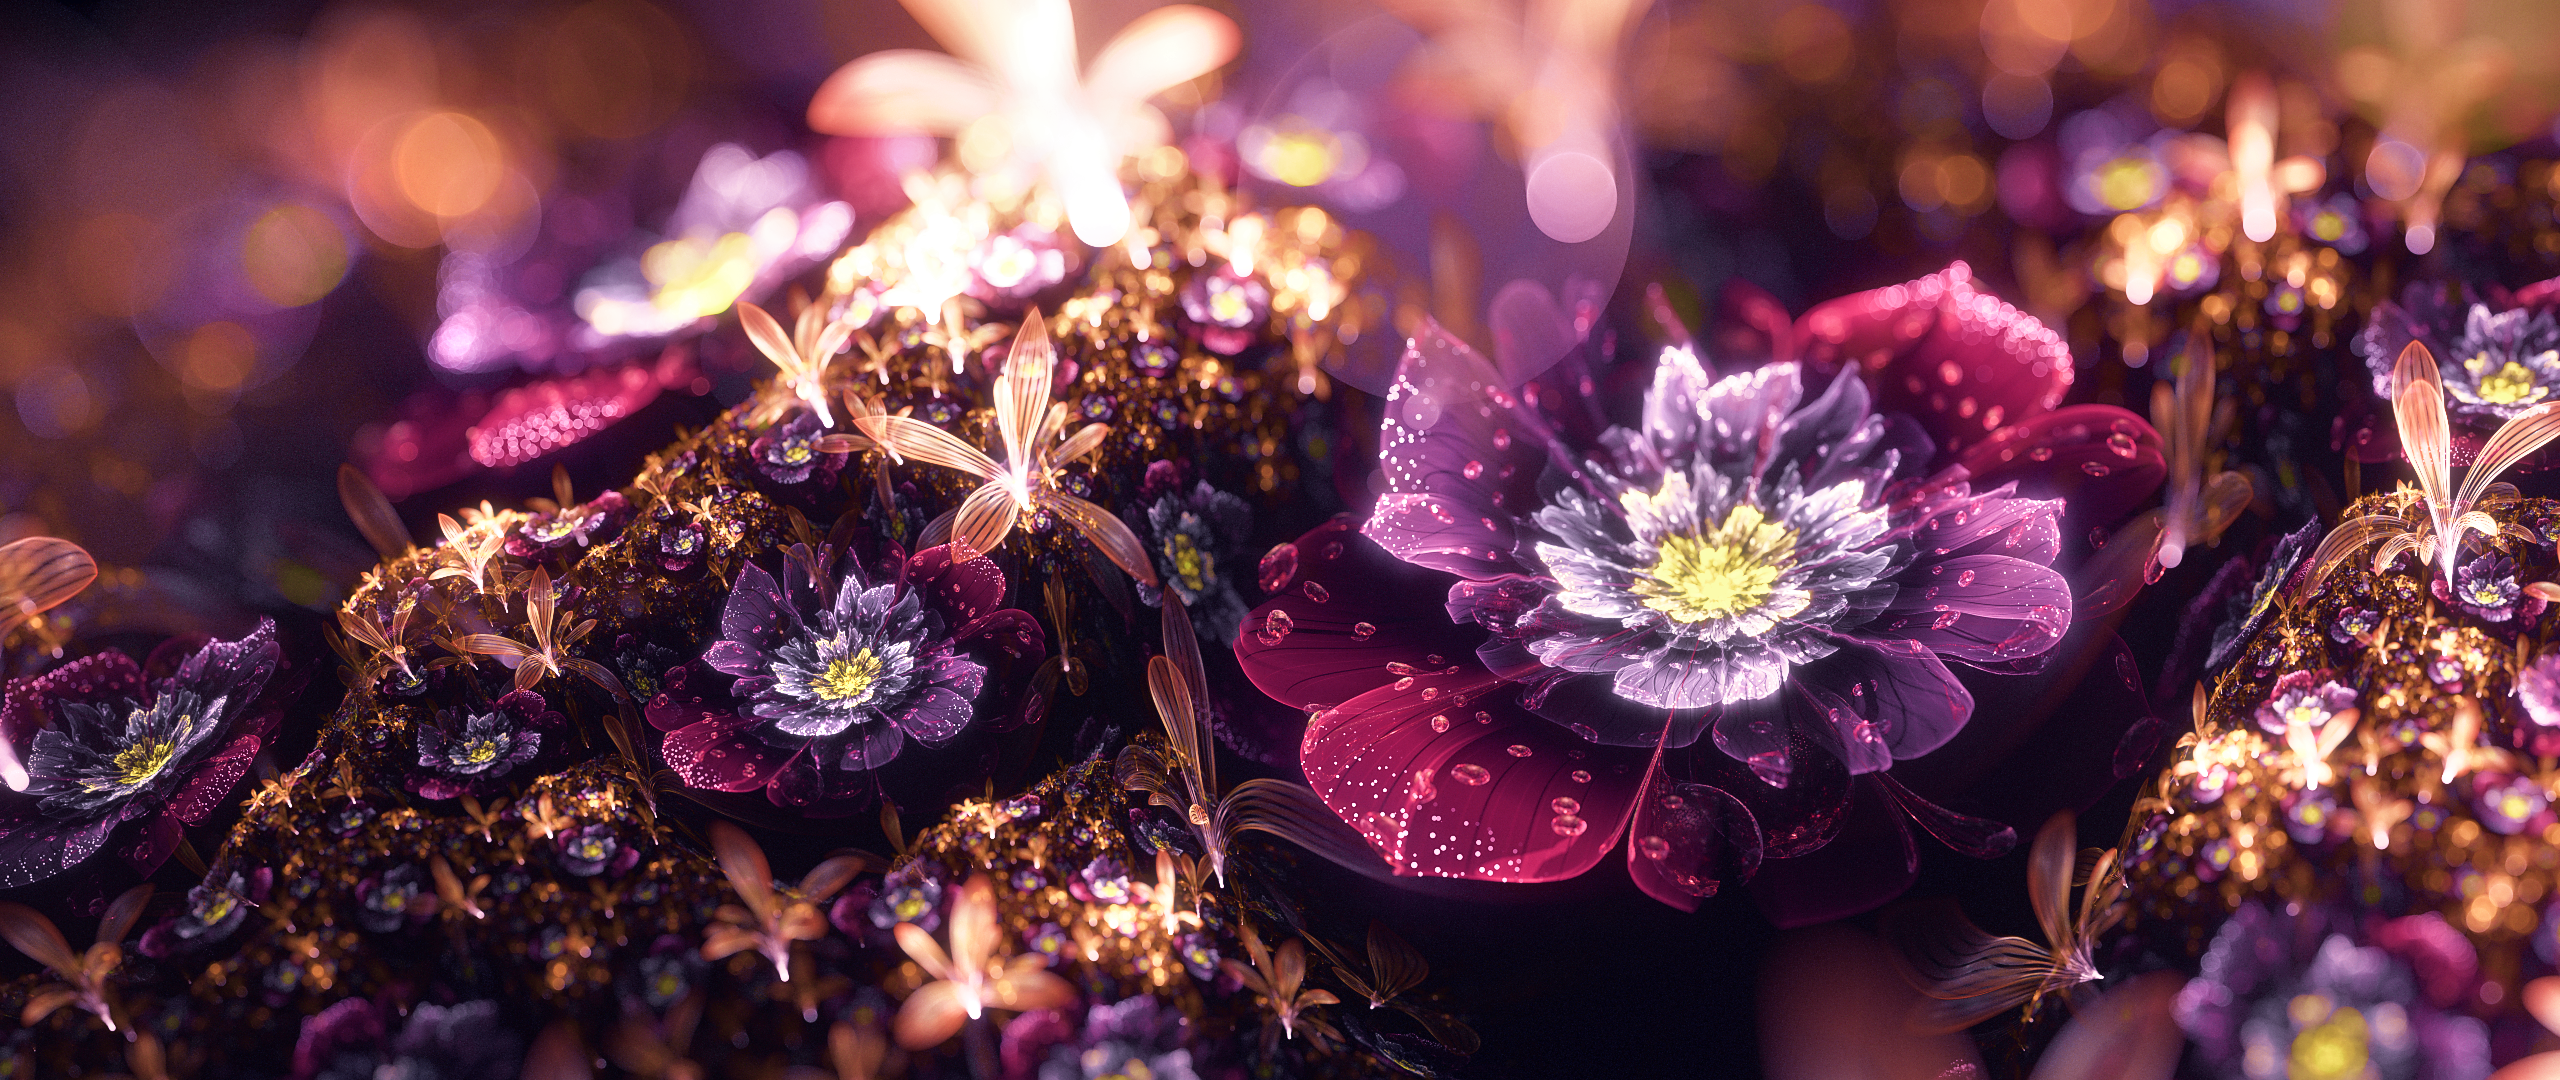 Natural Purples by SallySlips.deviantart.com on @DeviantArt